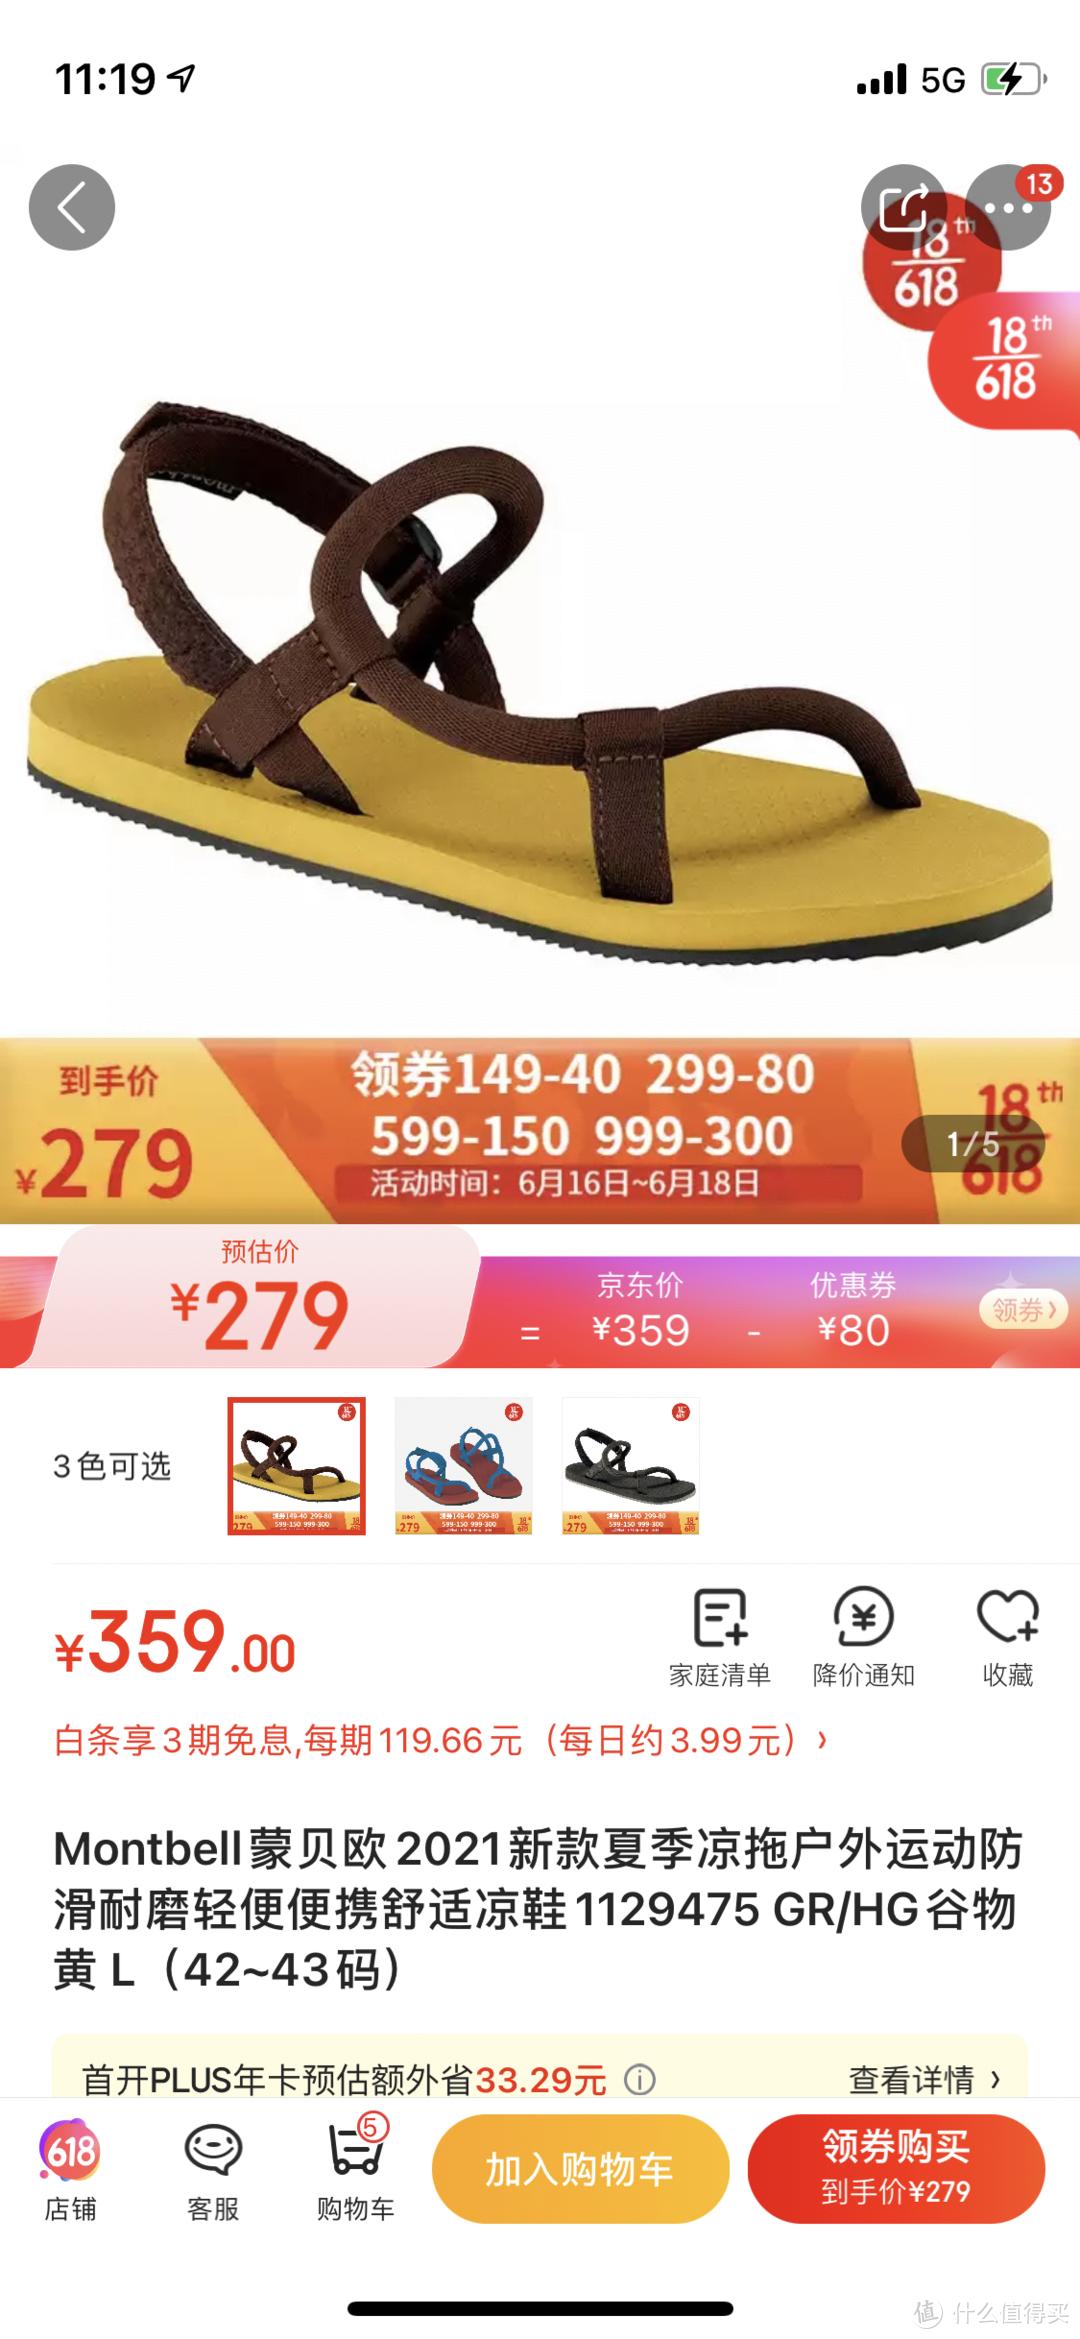 618晒物之 montbell凉鞋,,,,,,,